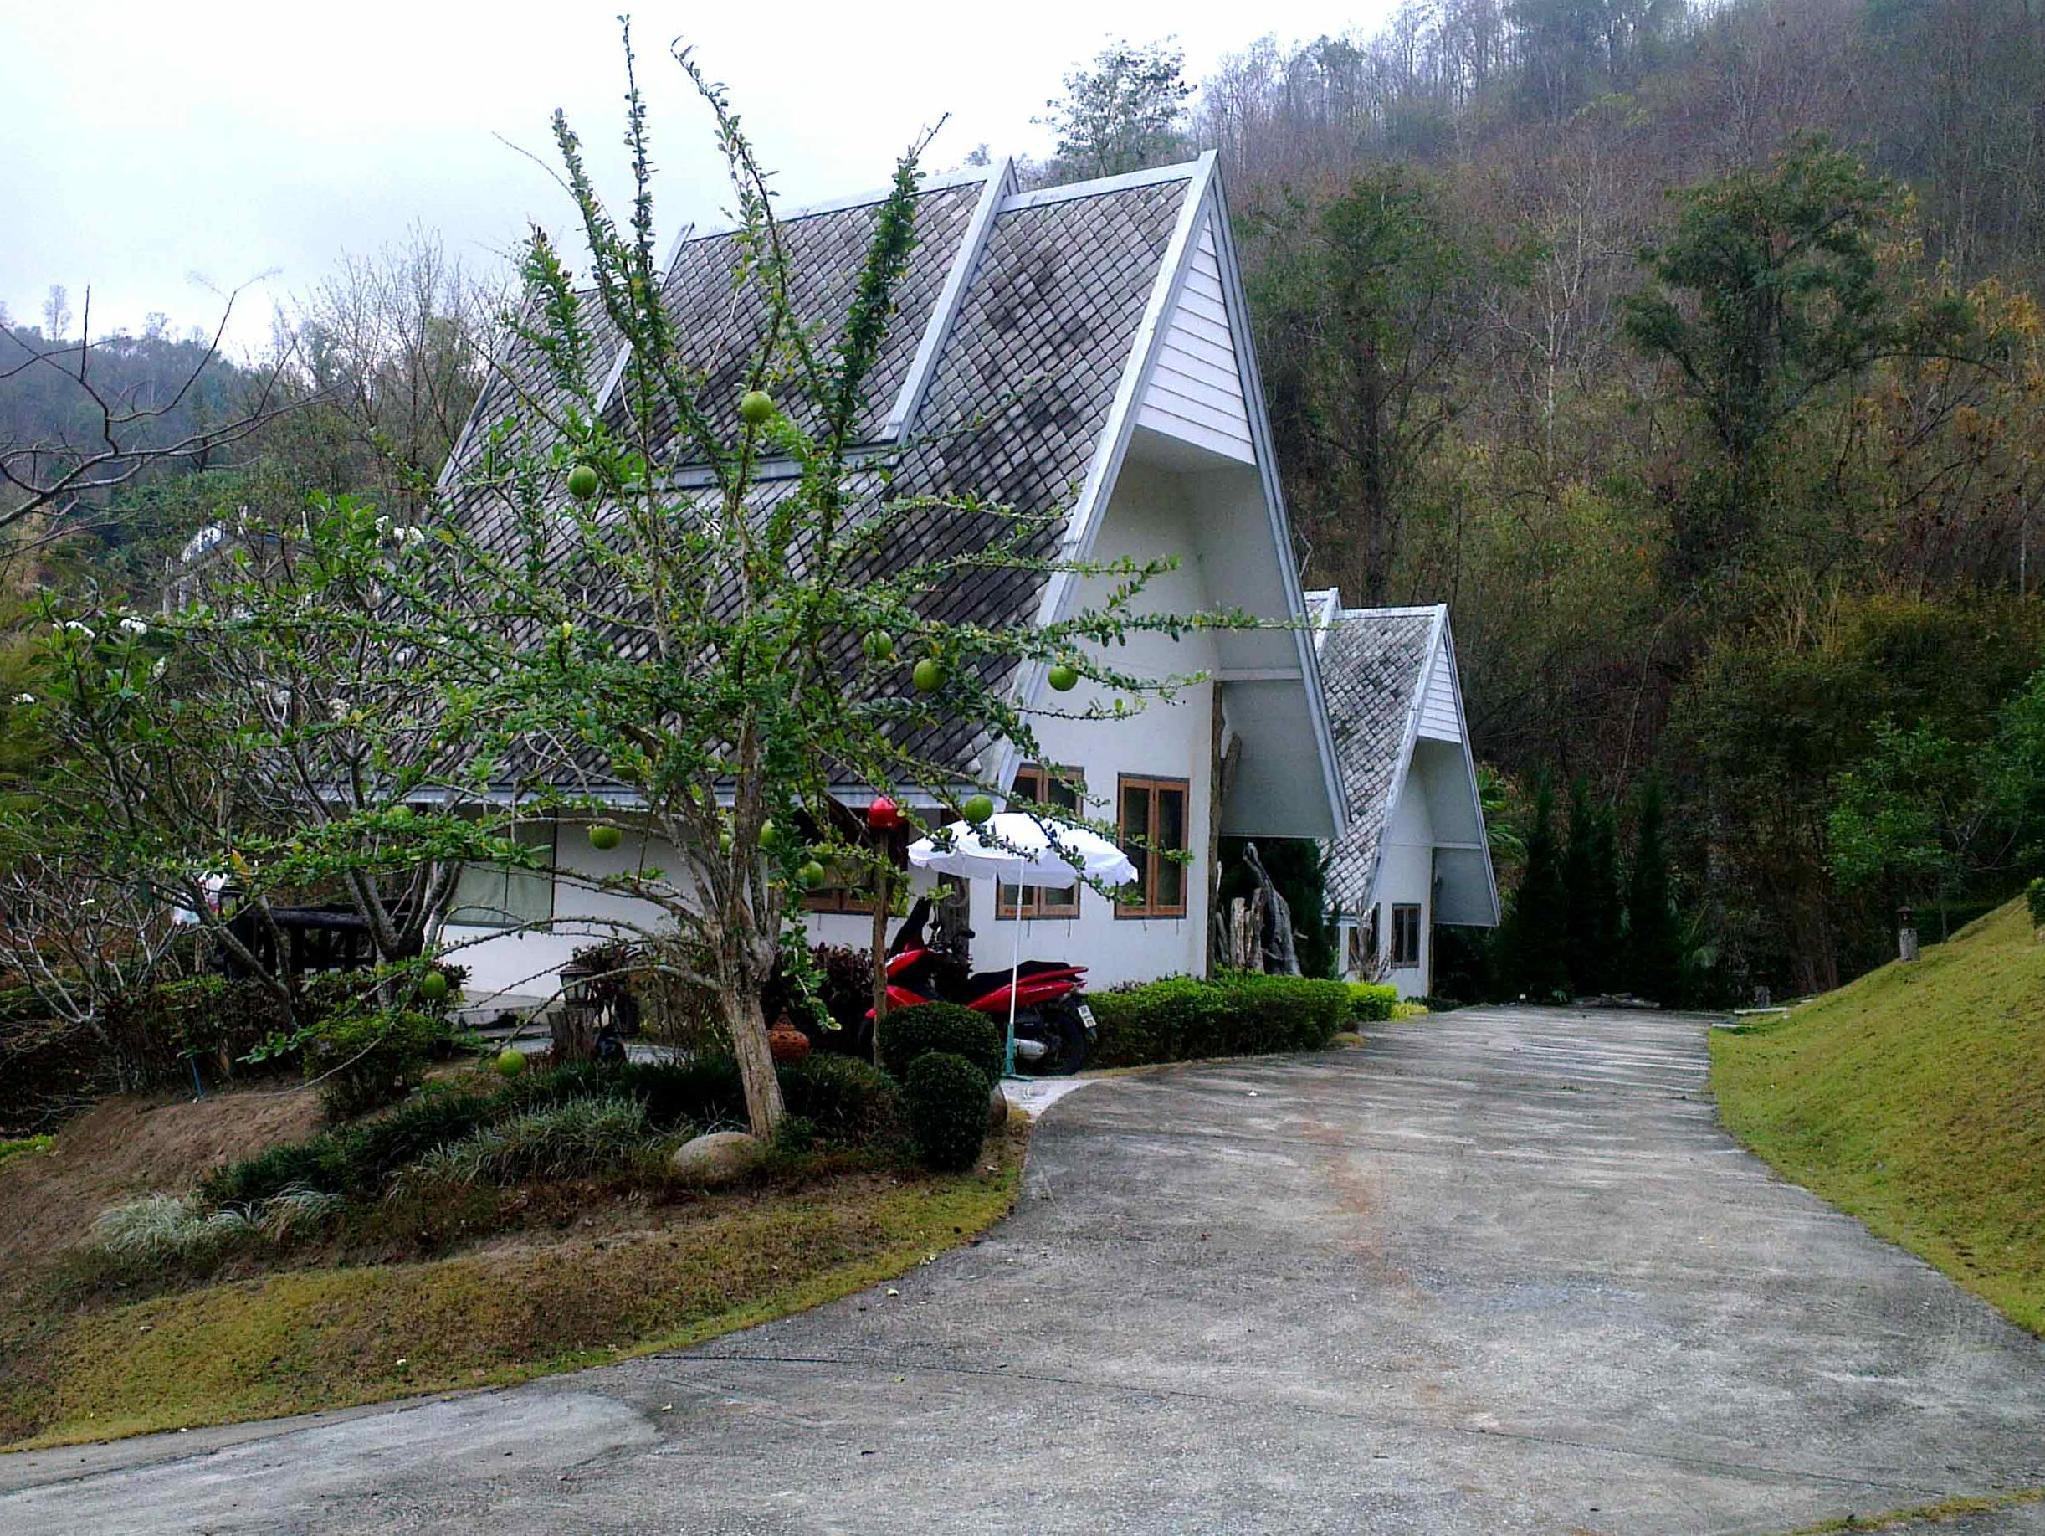 Resort Ping Pana Valley รีสอร์ต พิง พานา แวลเลย์